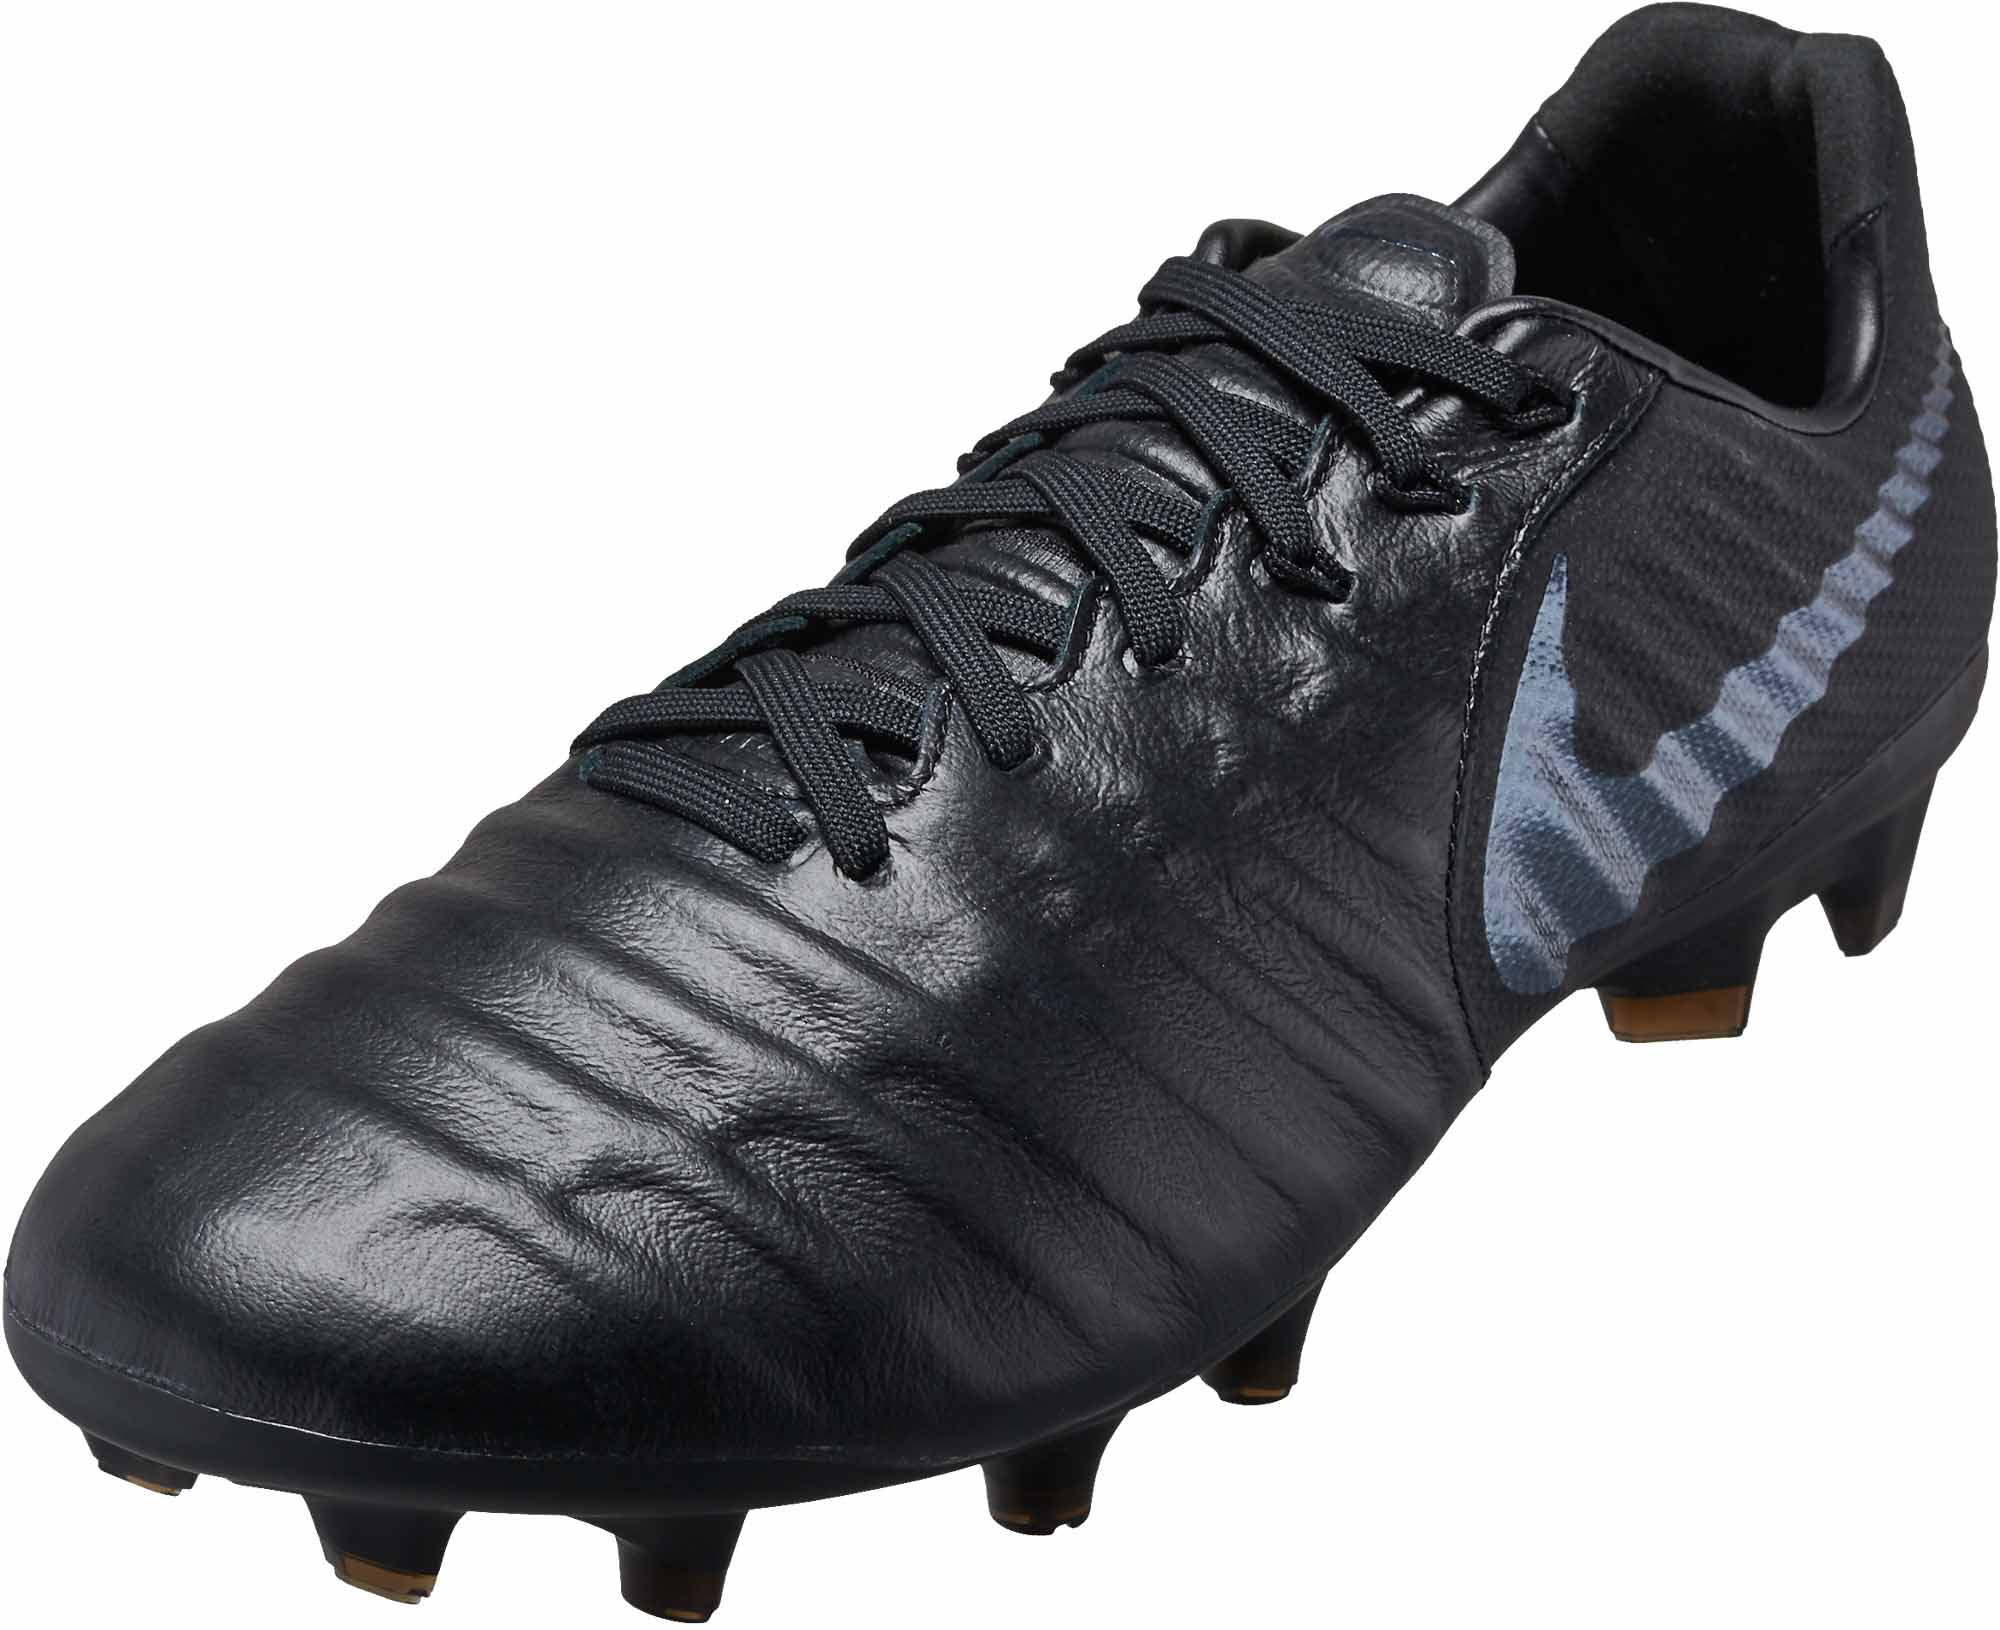 Nike Tiempo Legend 7 Pro FG - Black